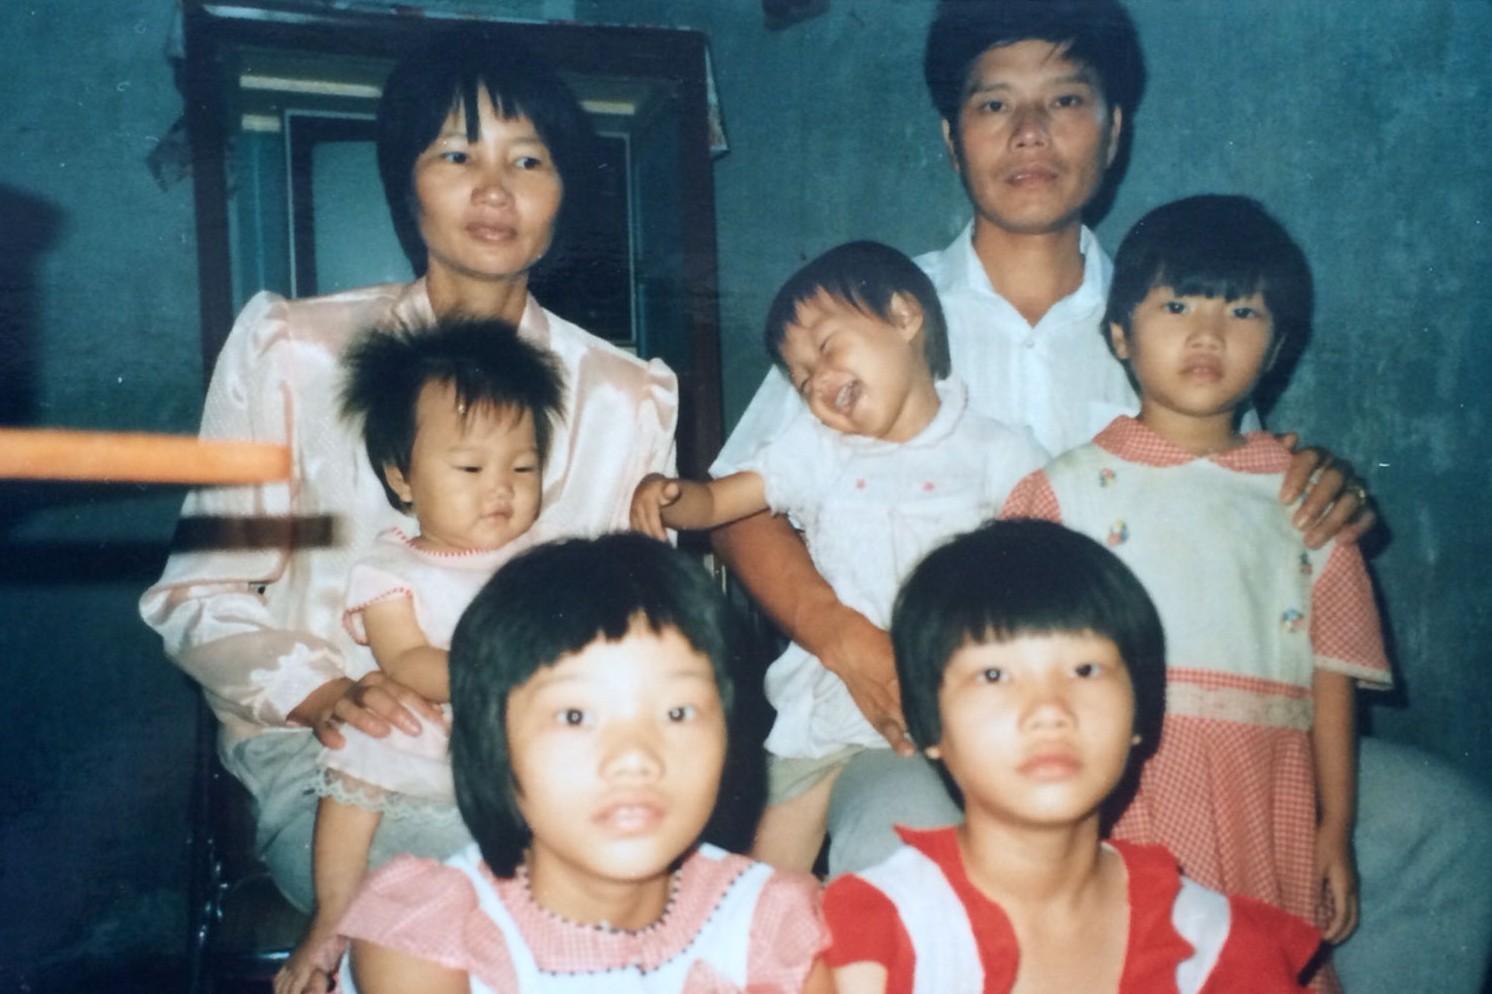 wong family 2